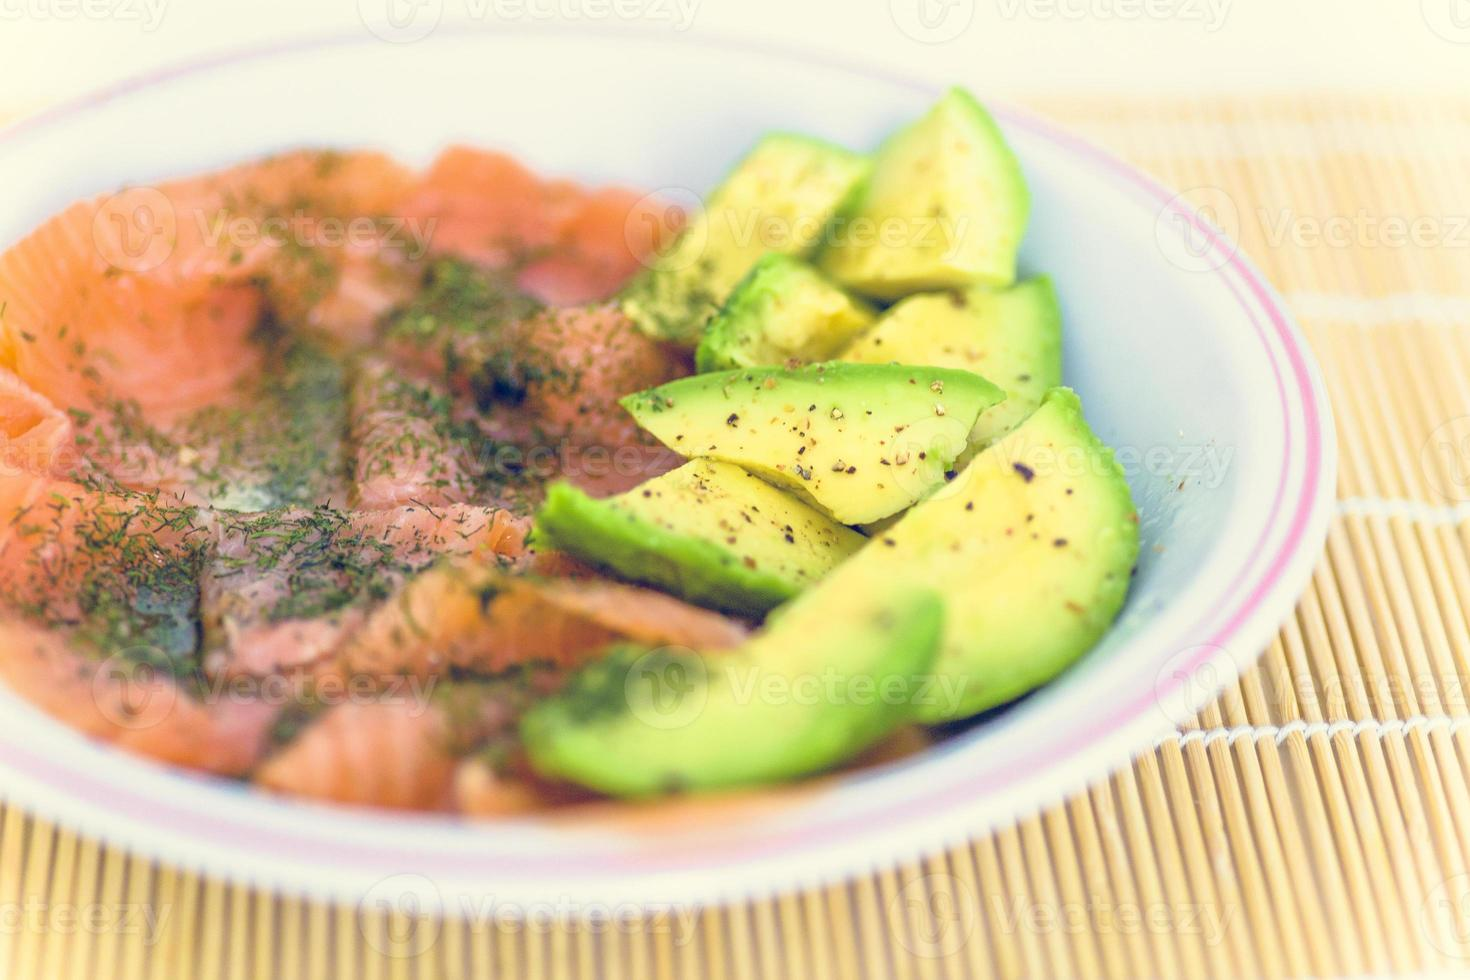 gezonde recepten: avocado, gerookte zalm en kruiden foto